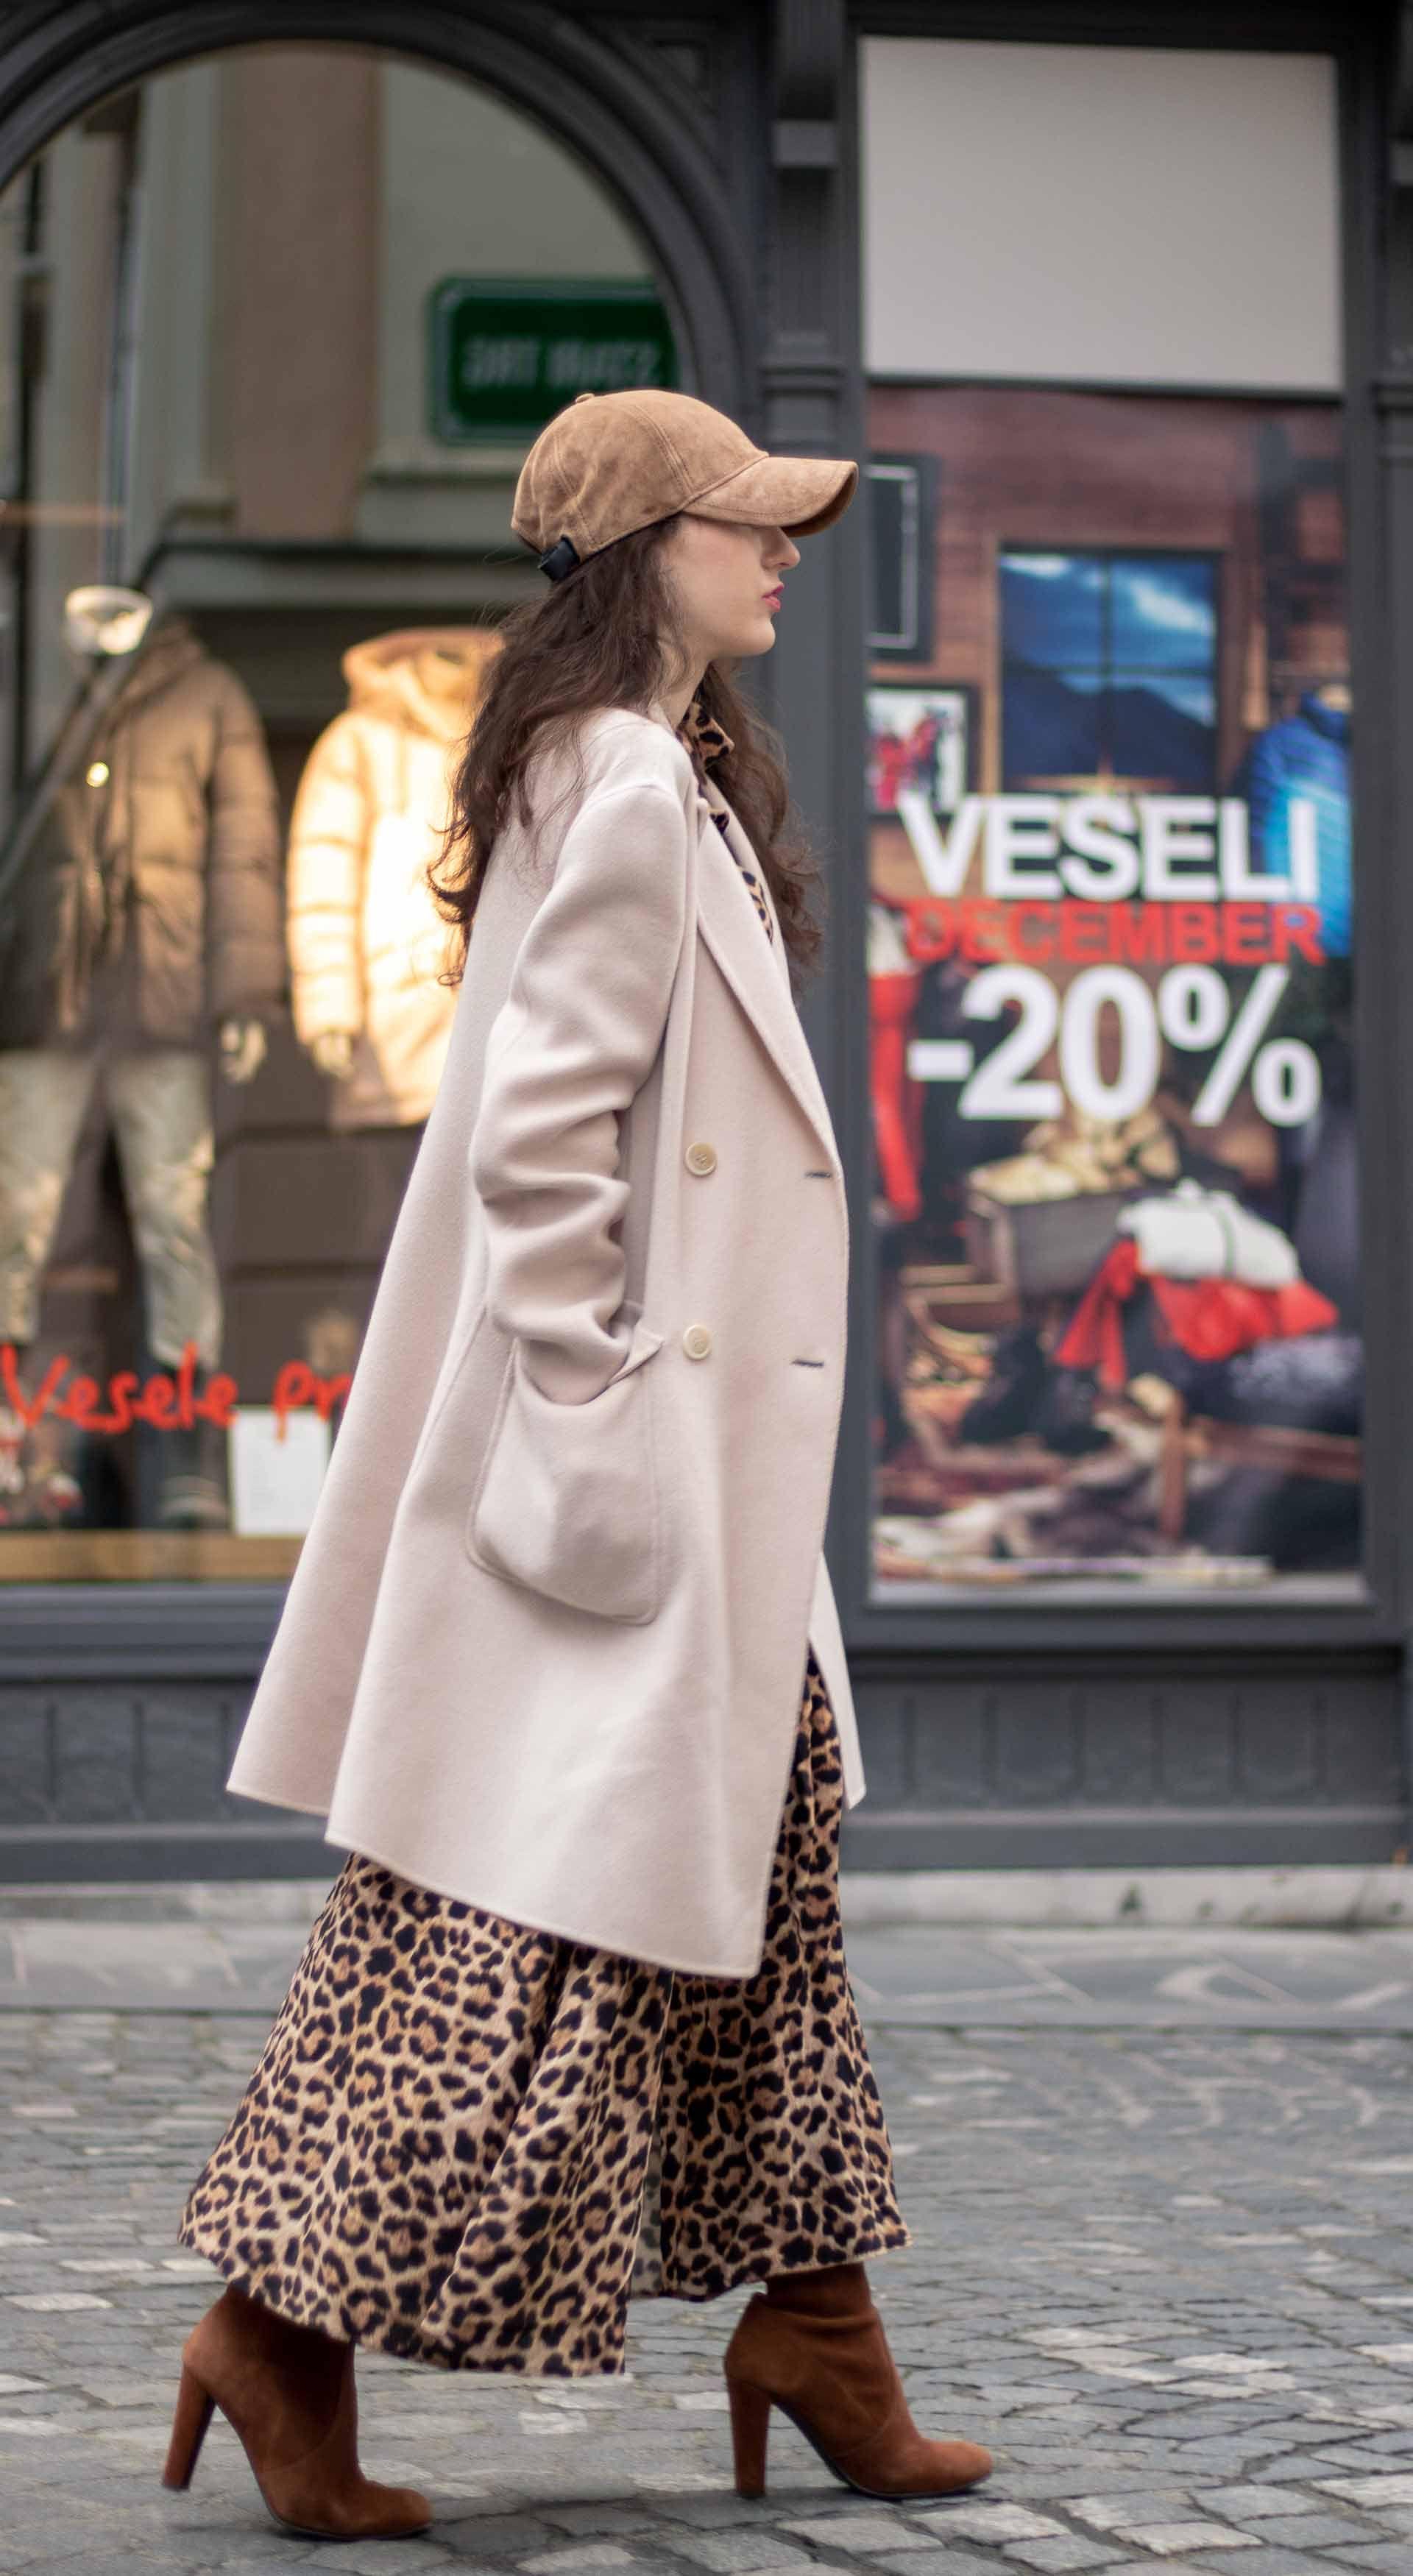 3740bfbdc34 Must follow Slovenian Fashion Blogger Veronika Lipar of Brunette from Wall  Street wearing brown Rag   Bone baseball cap